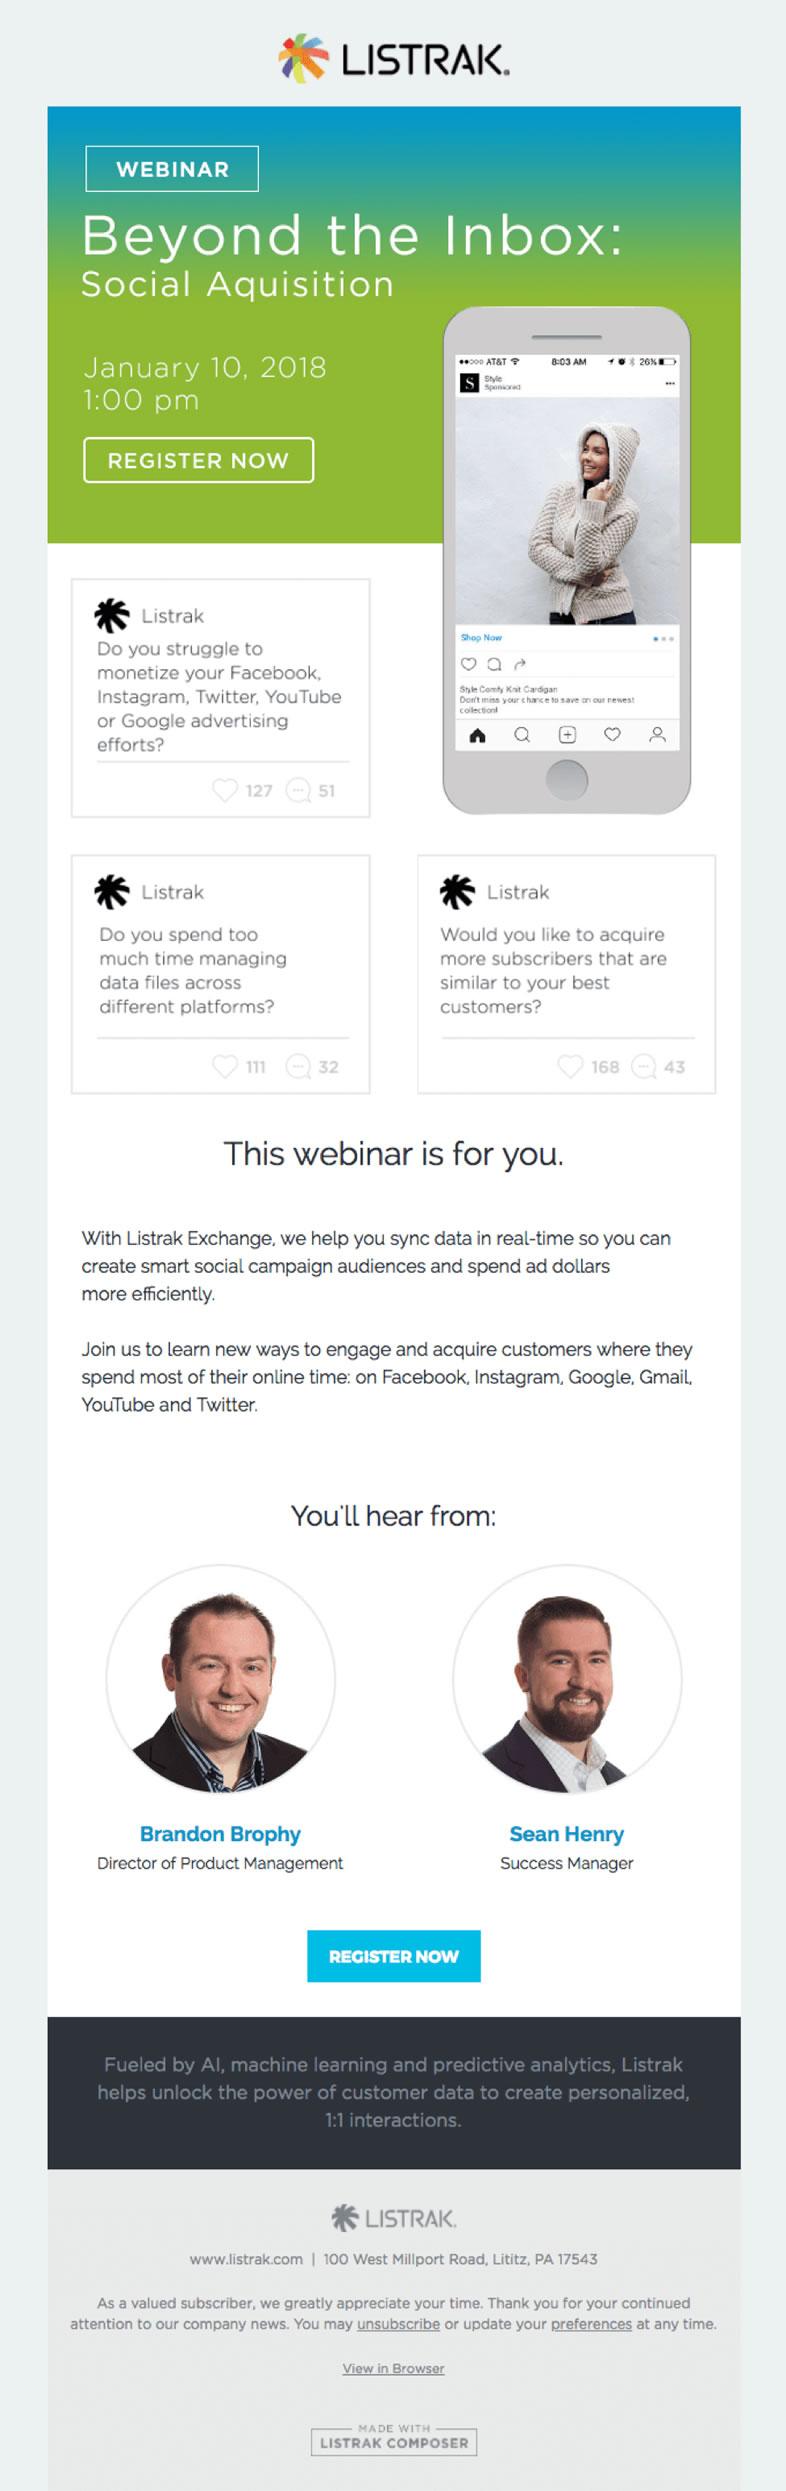 Newsletter que generan nuevos leads: Listrak